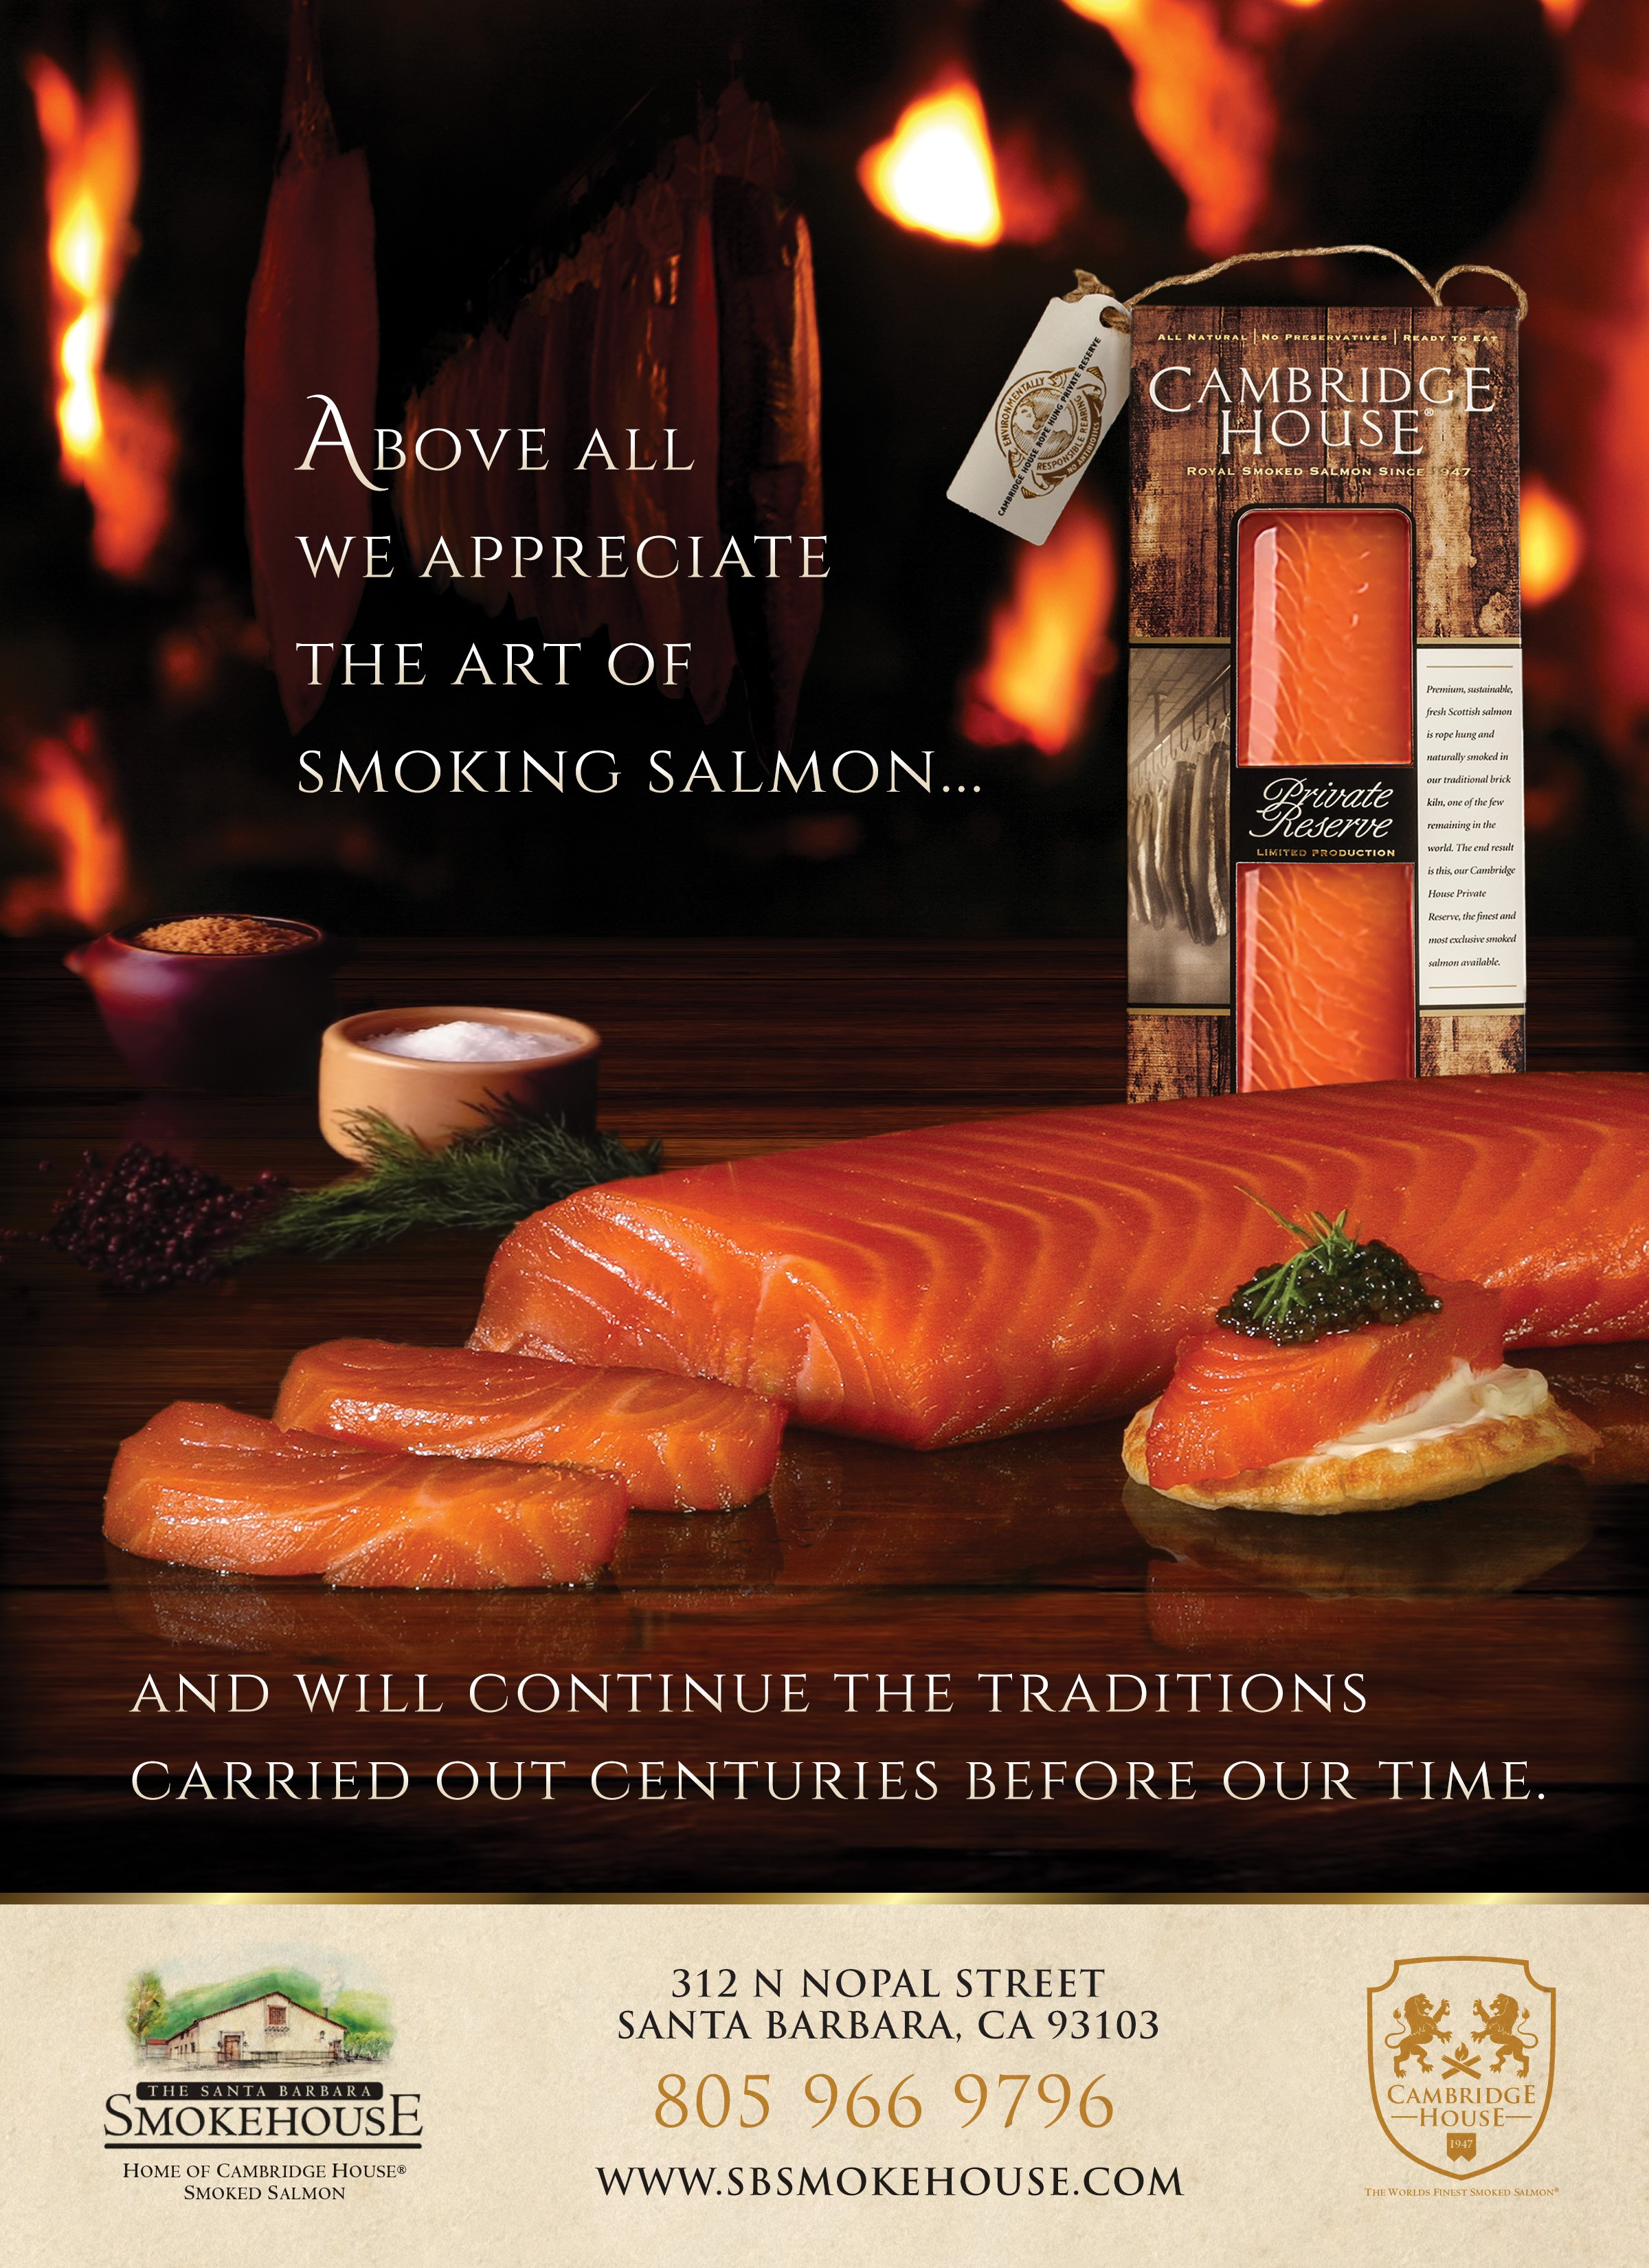 Cambridge House Smoked Salmon Magazine Ad